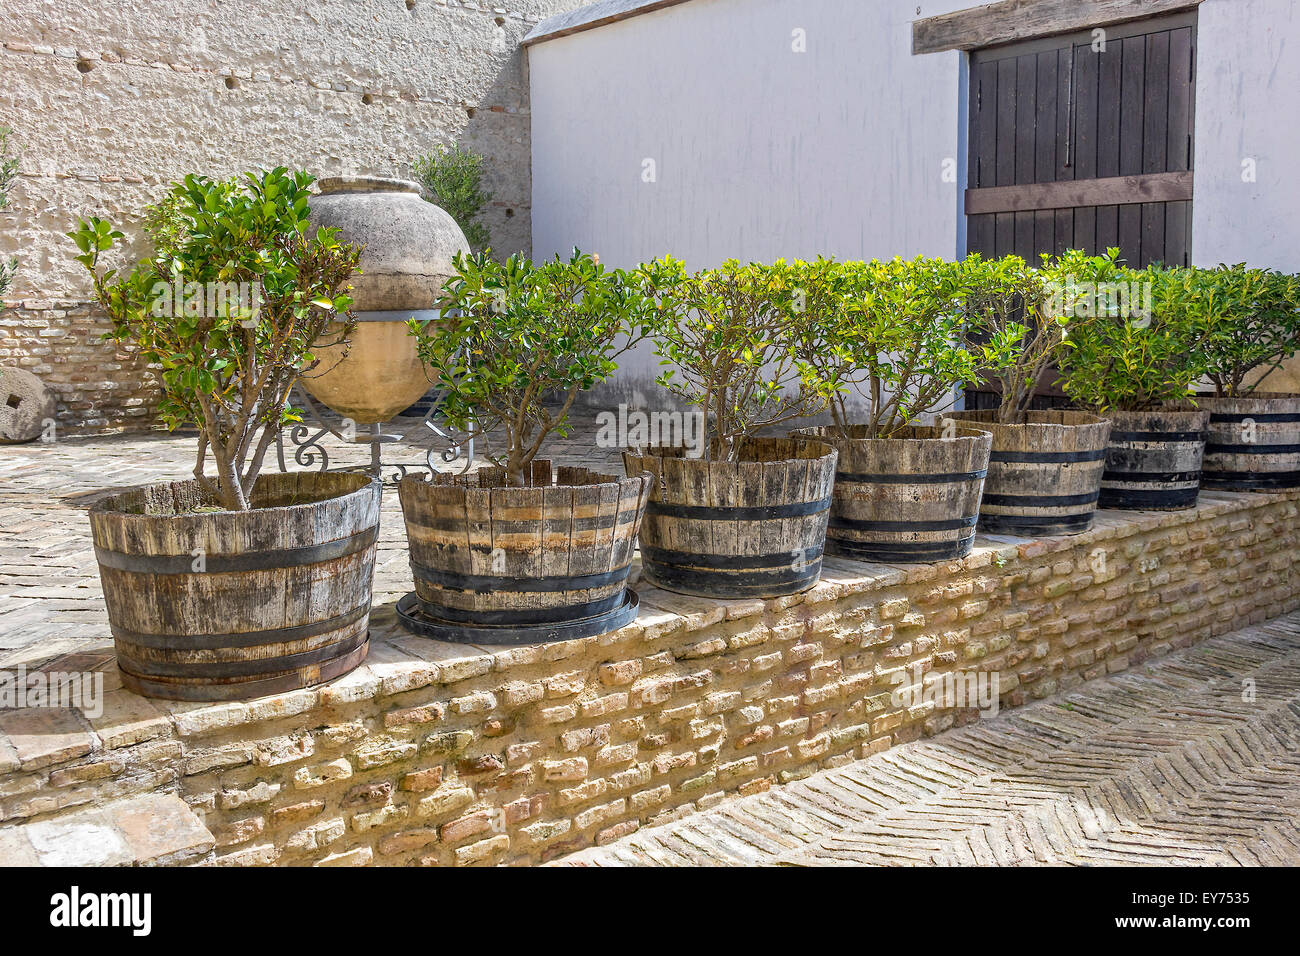 Terrasse mit Garten Töpfe Alcazar Jerez De La Frontera Andalusien Spanien Stockbild